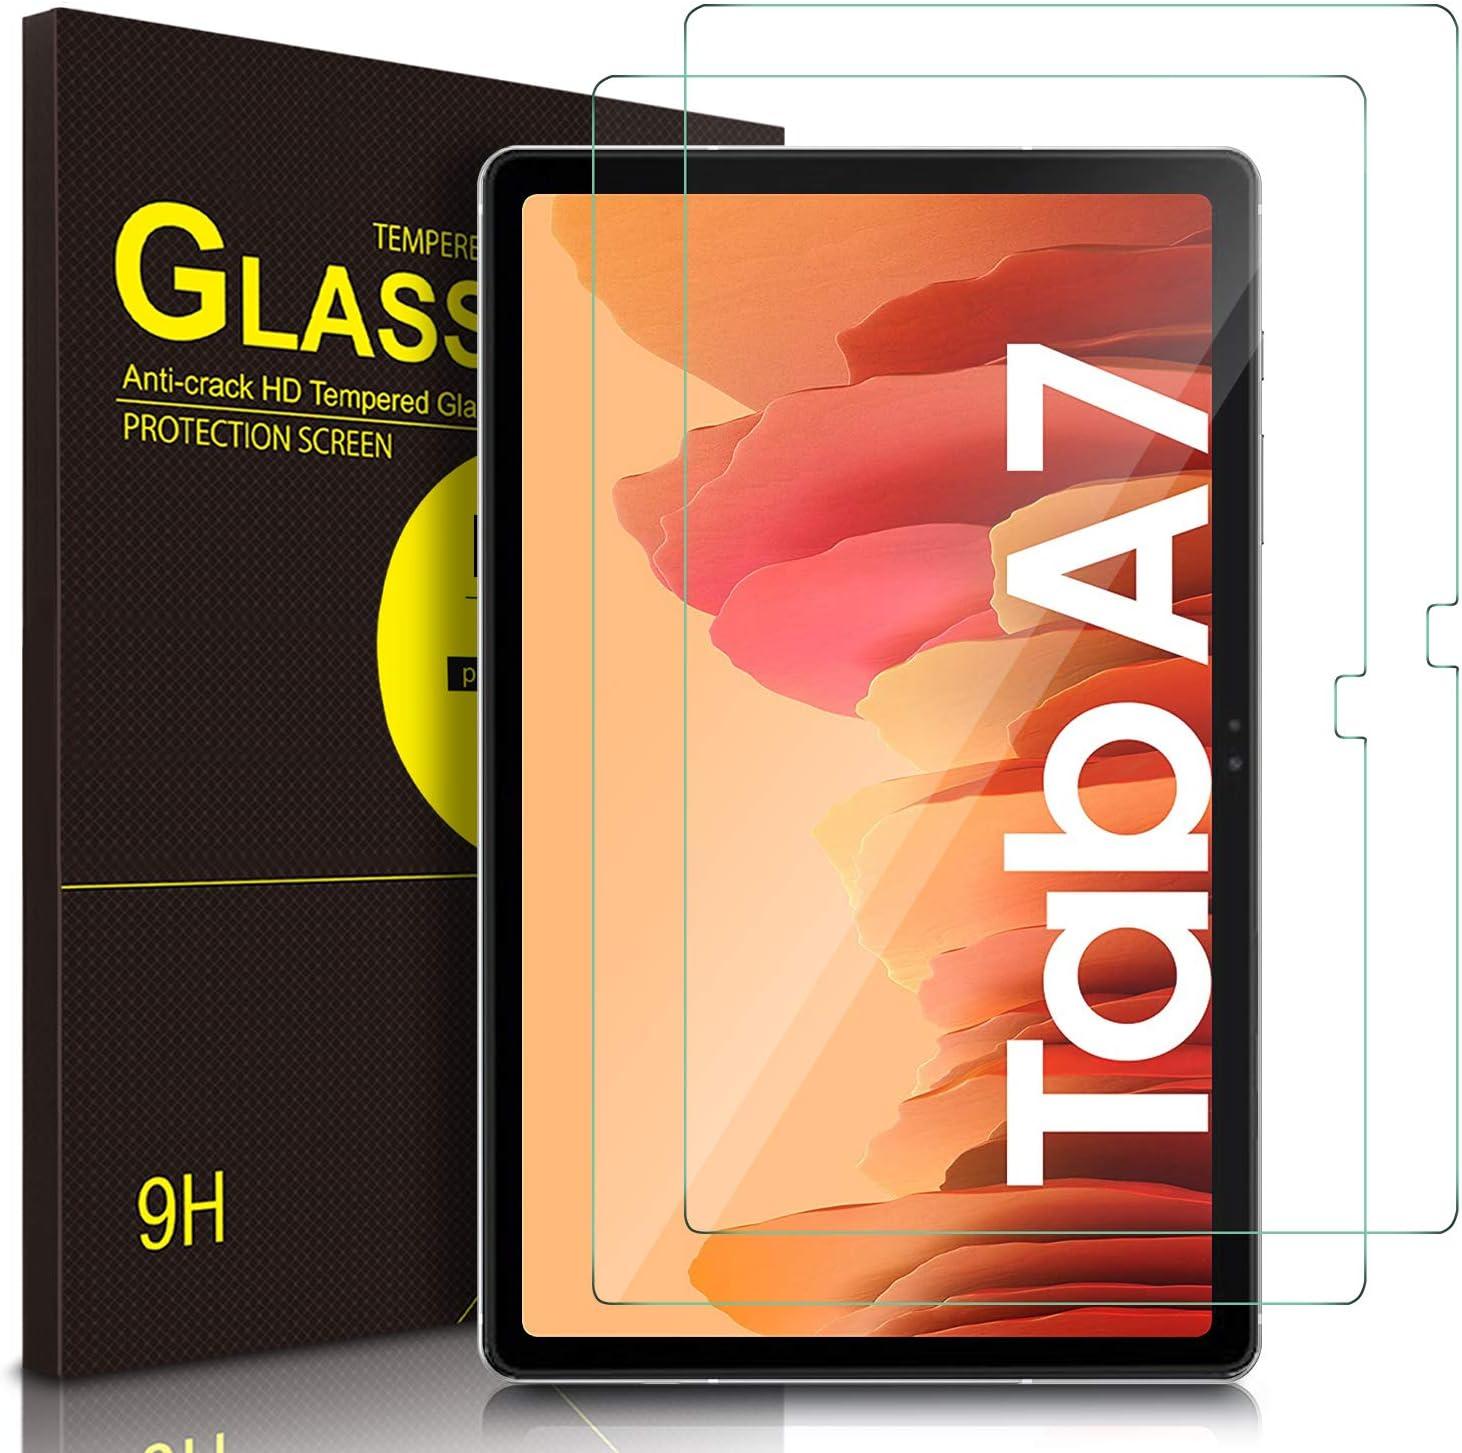 ELTD Protector de Pantalla para Samsung Galaxy Tab A 10.4 2020, 9H,2.5D, Vidrio Templado Glass Film Protector de Pantalla para Samsung Galaxy Tab A7 10.4 Pulgada dispositivoa, 2 Pack